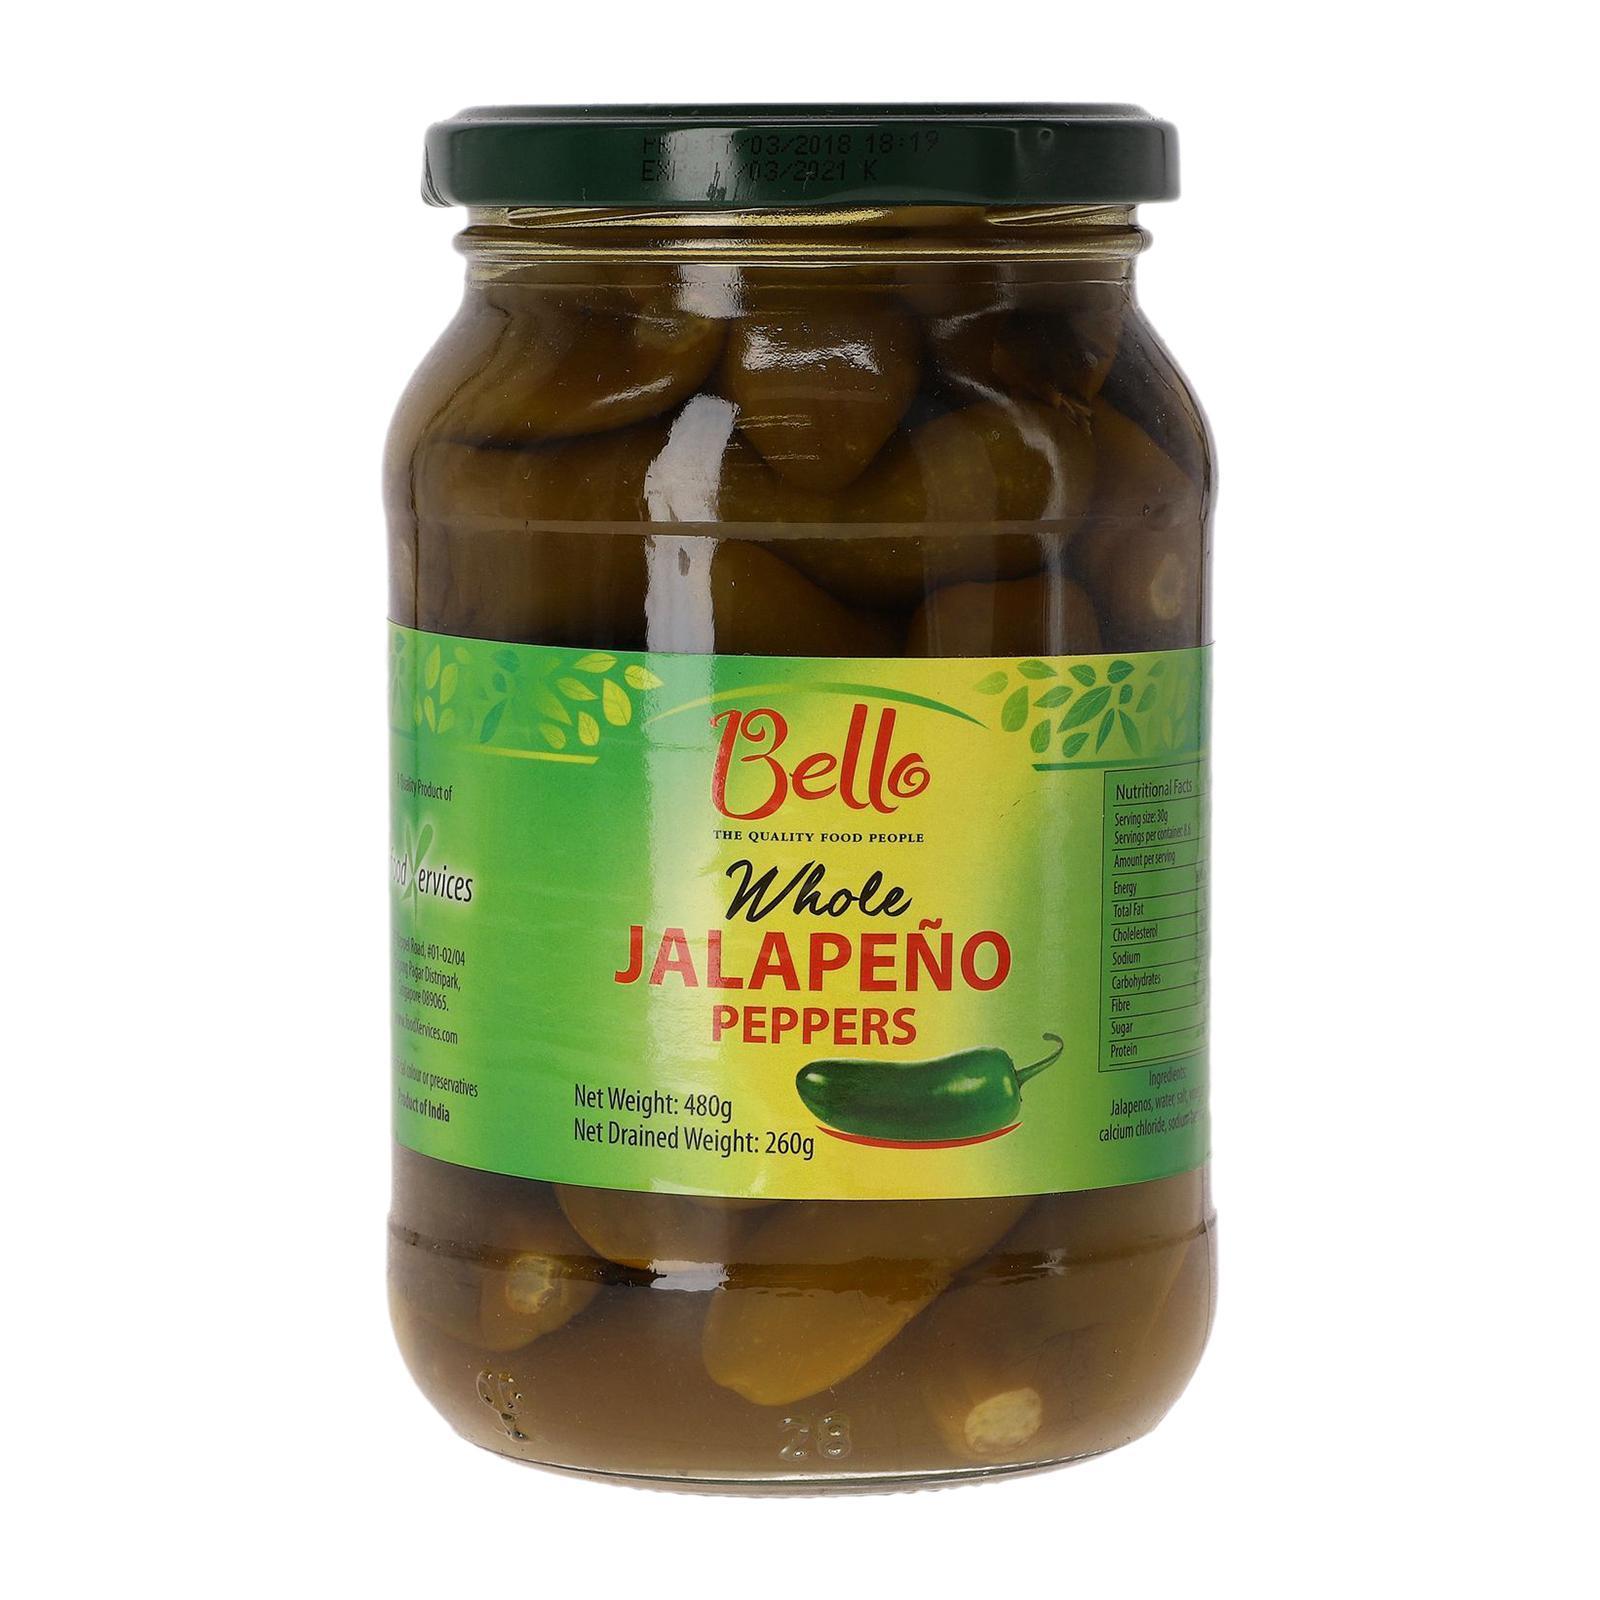 Bello Whole Jalapeno Pepper